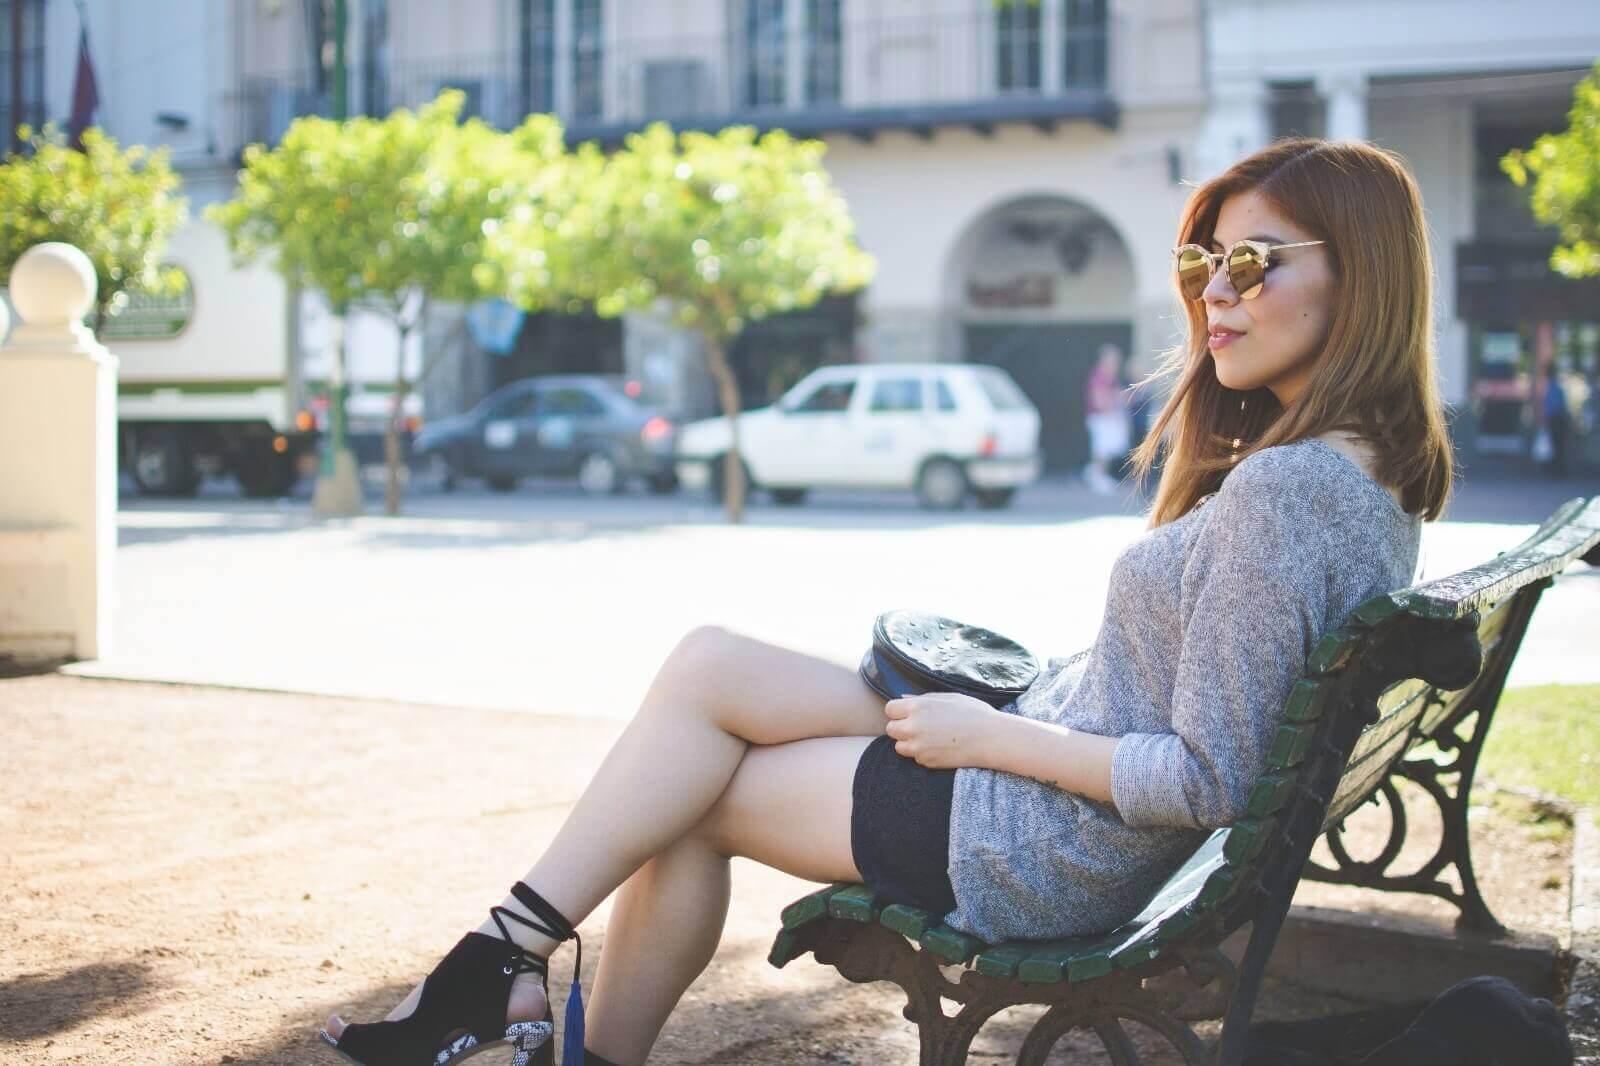 zaful-statement-shoes-silver-mirrored-sunglasses-deborah-ferrero-streetstyle-style-by-deb09